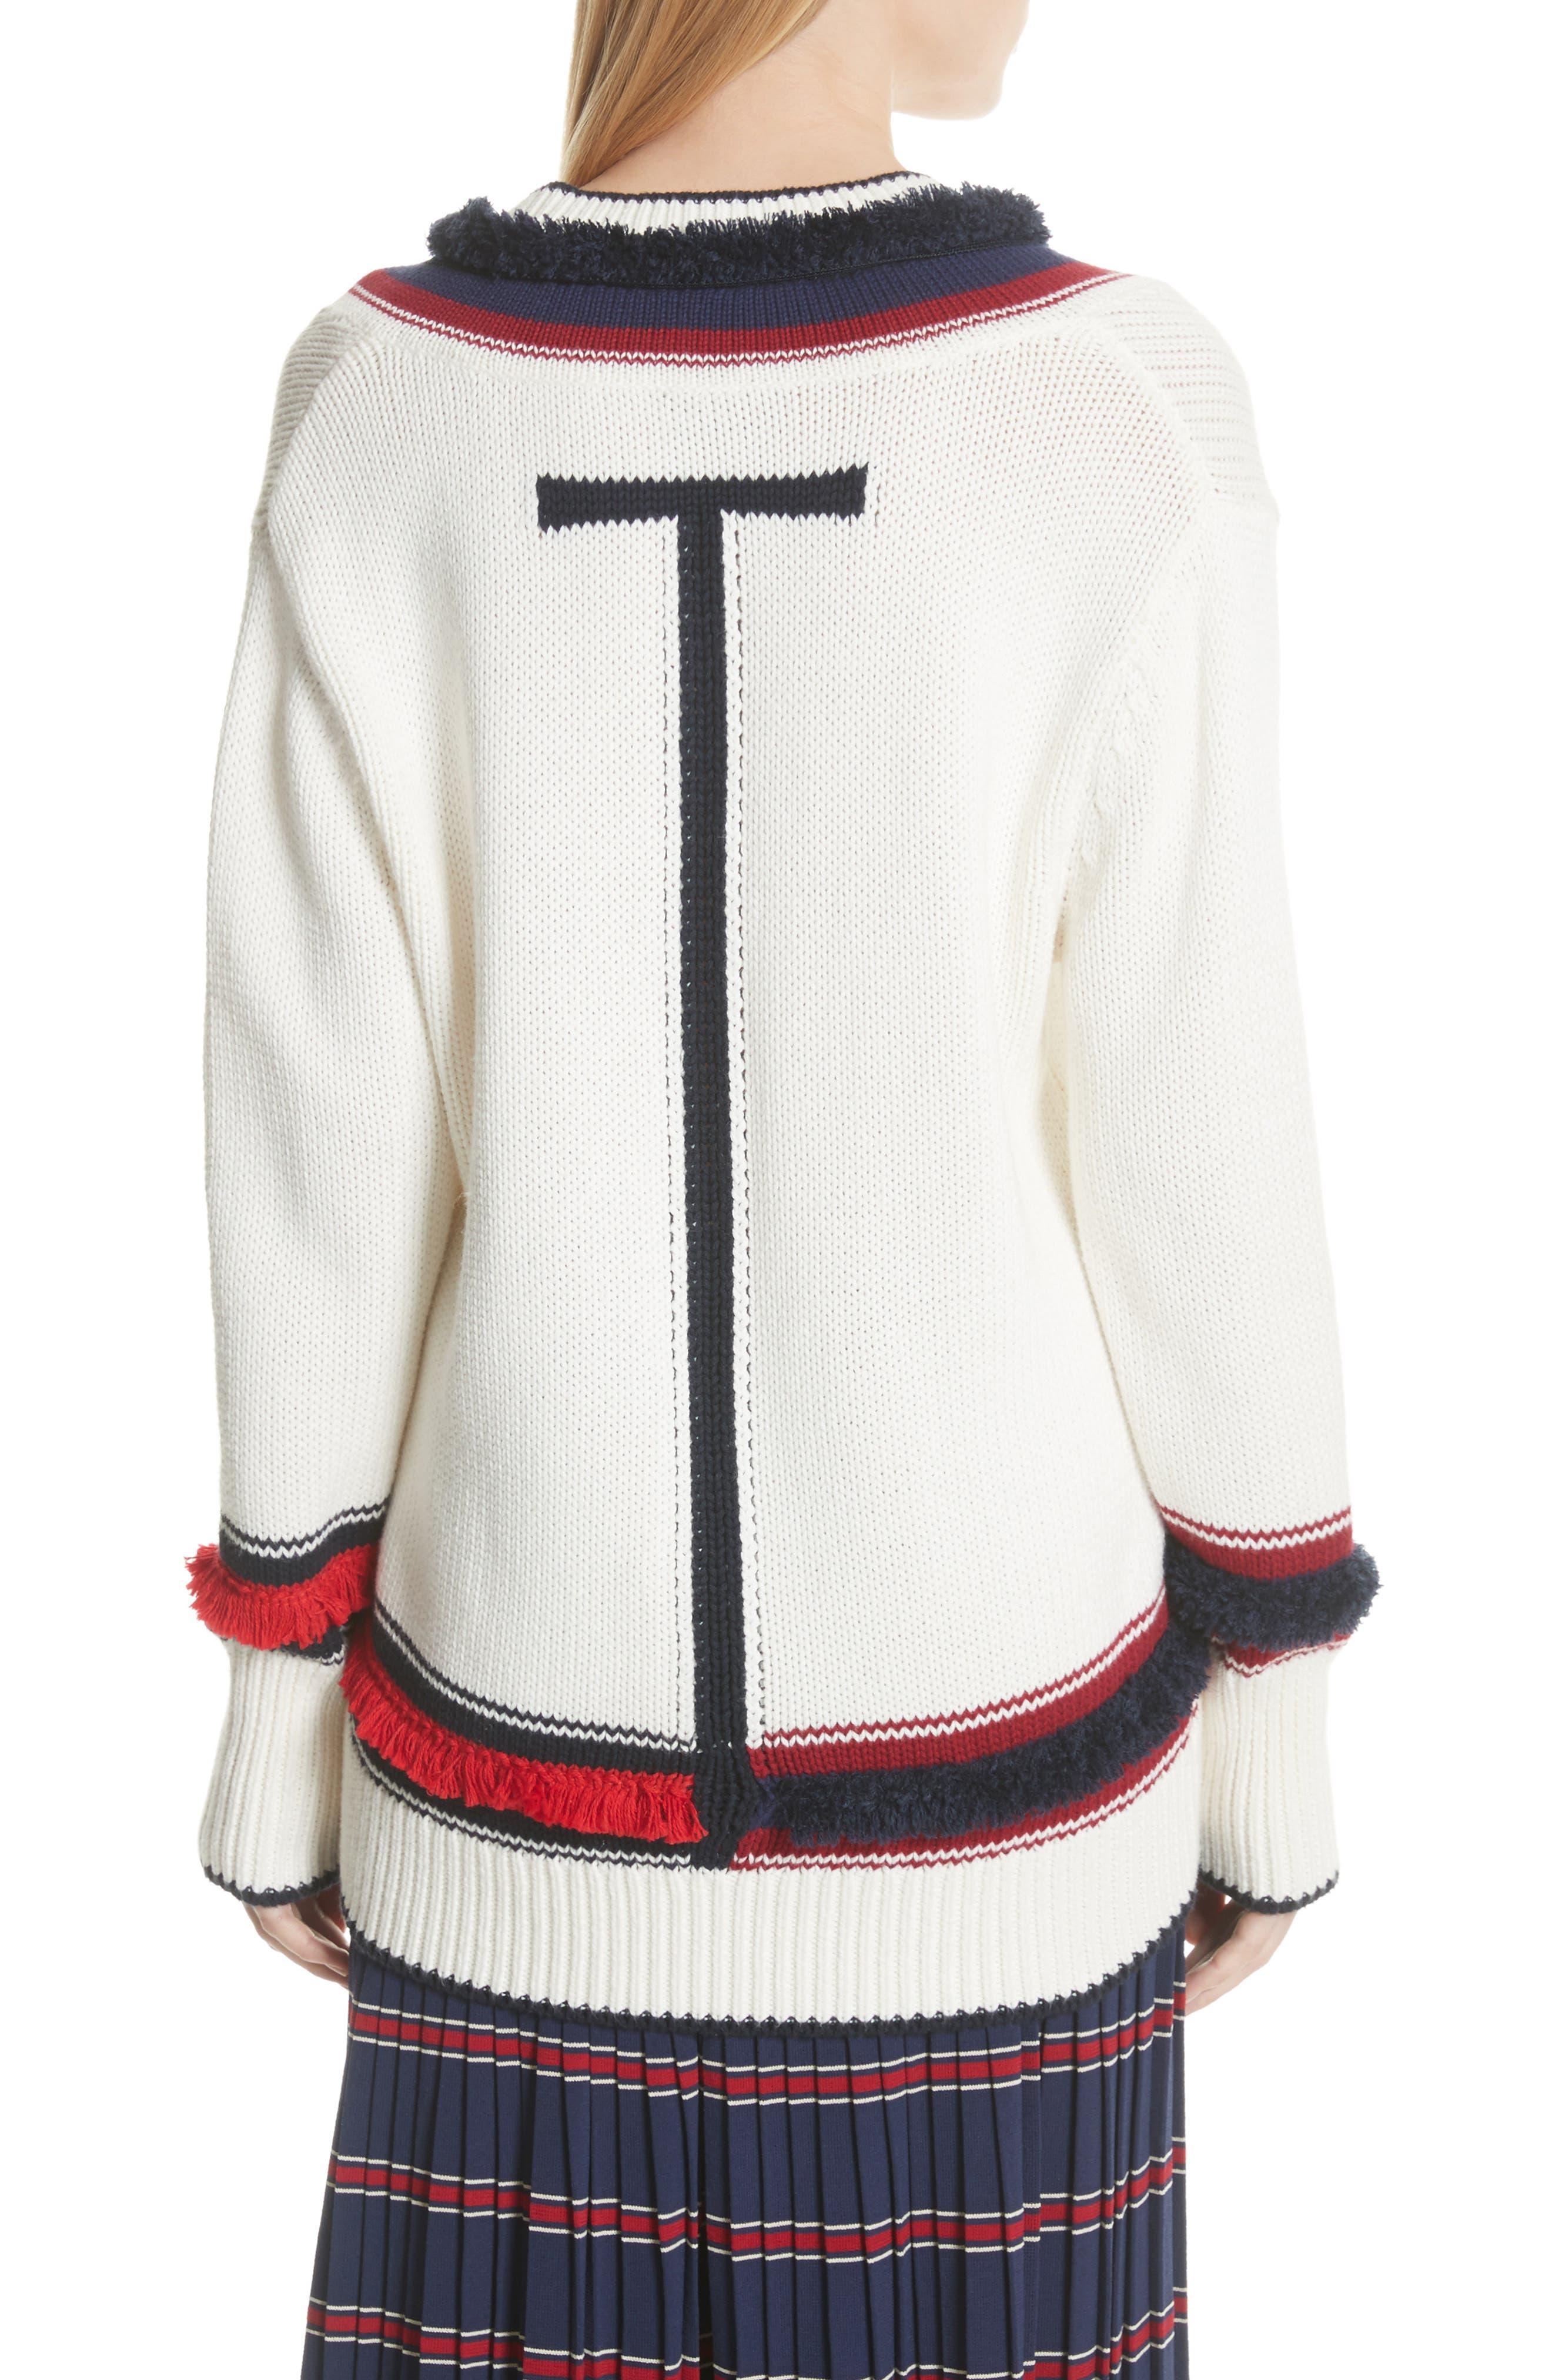 V-Neck Cotton & Cashmere Sweater,                             Alternate thumbnail 2, color,                             Ecru